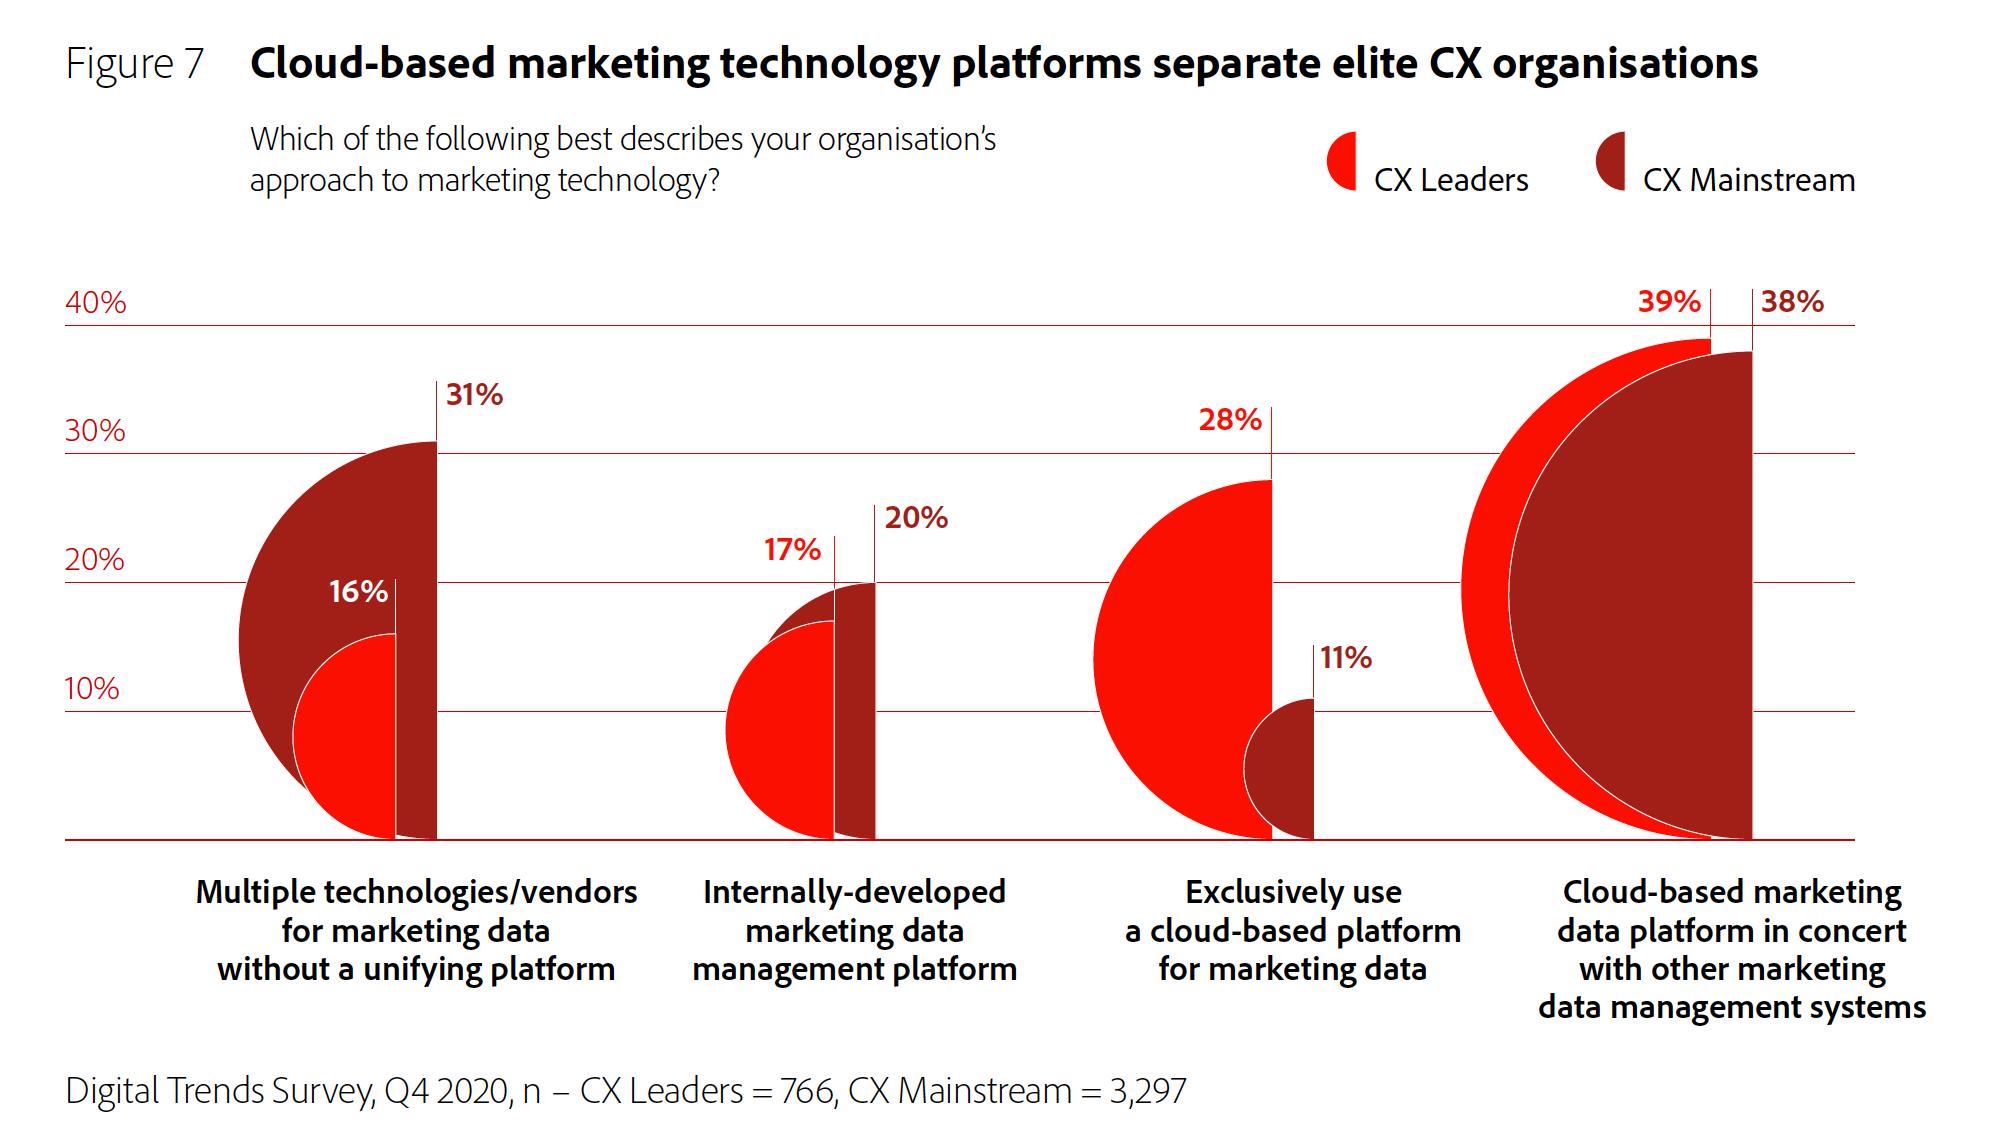 Figure 7: Cloud-based marketing technology platforms separate elite CX organisations.